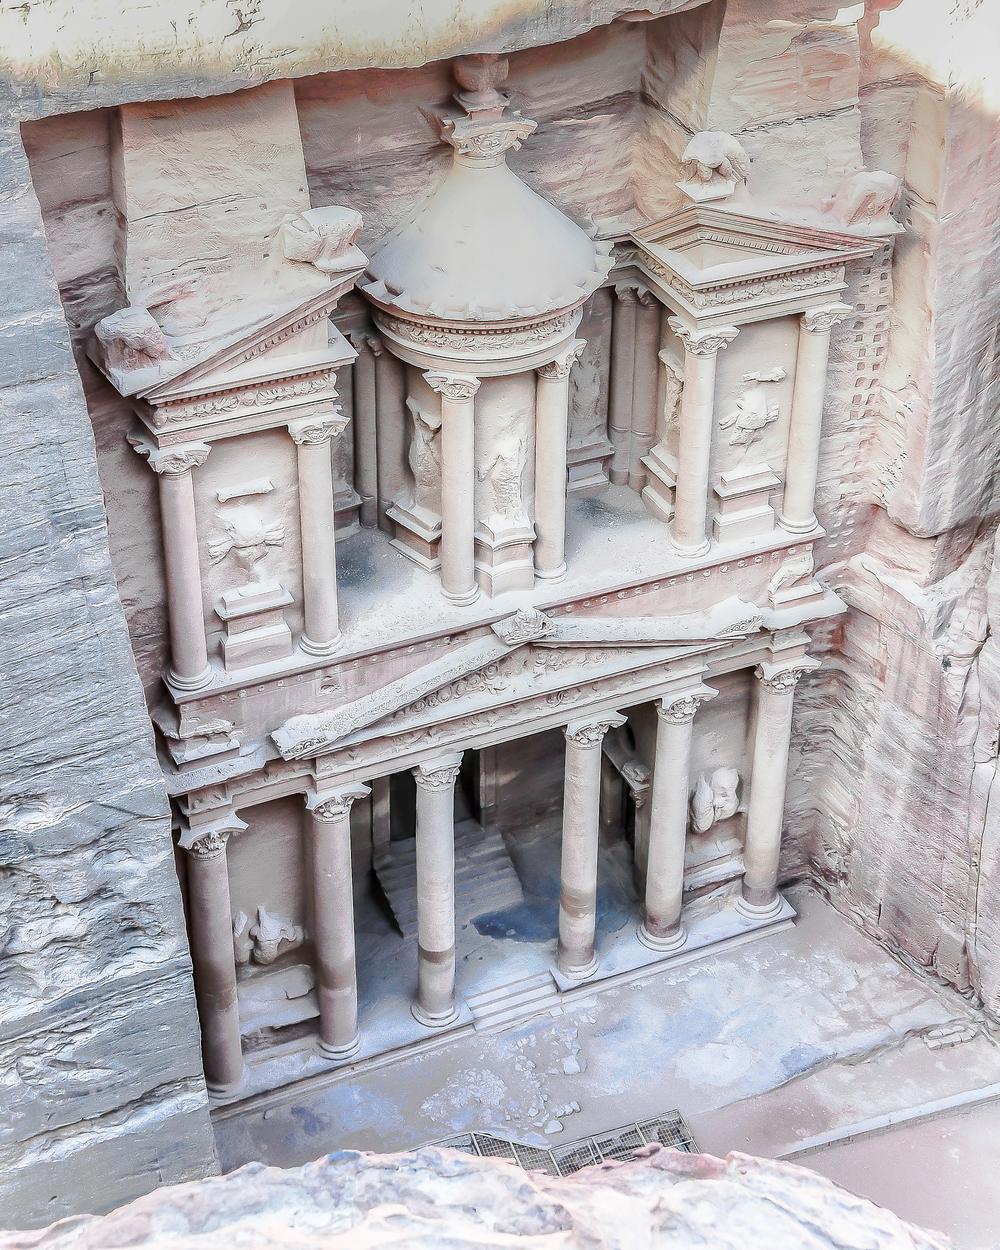 Desert Oasis - Petra (Jordan)